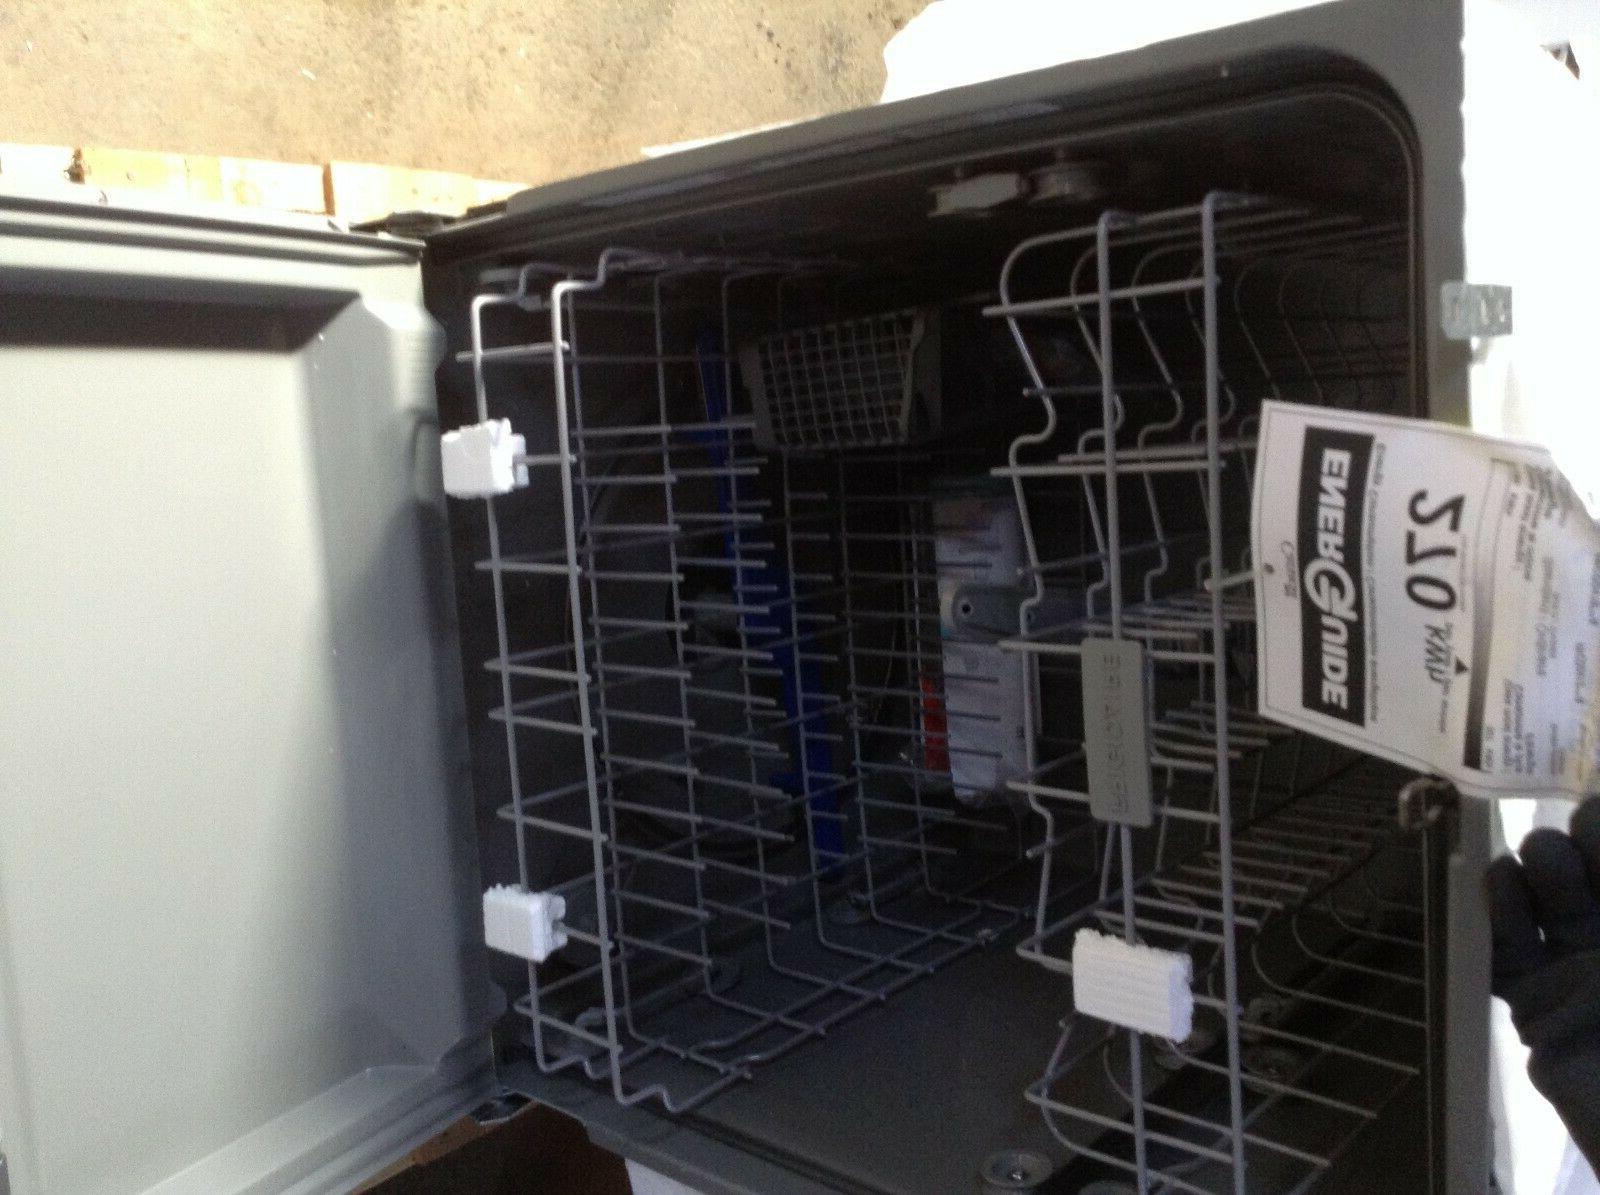 Brand Frigidaire Built-In Tub Dishwasher